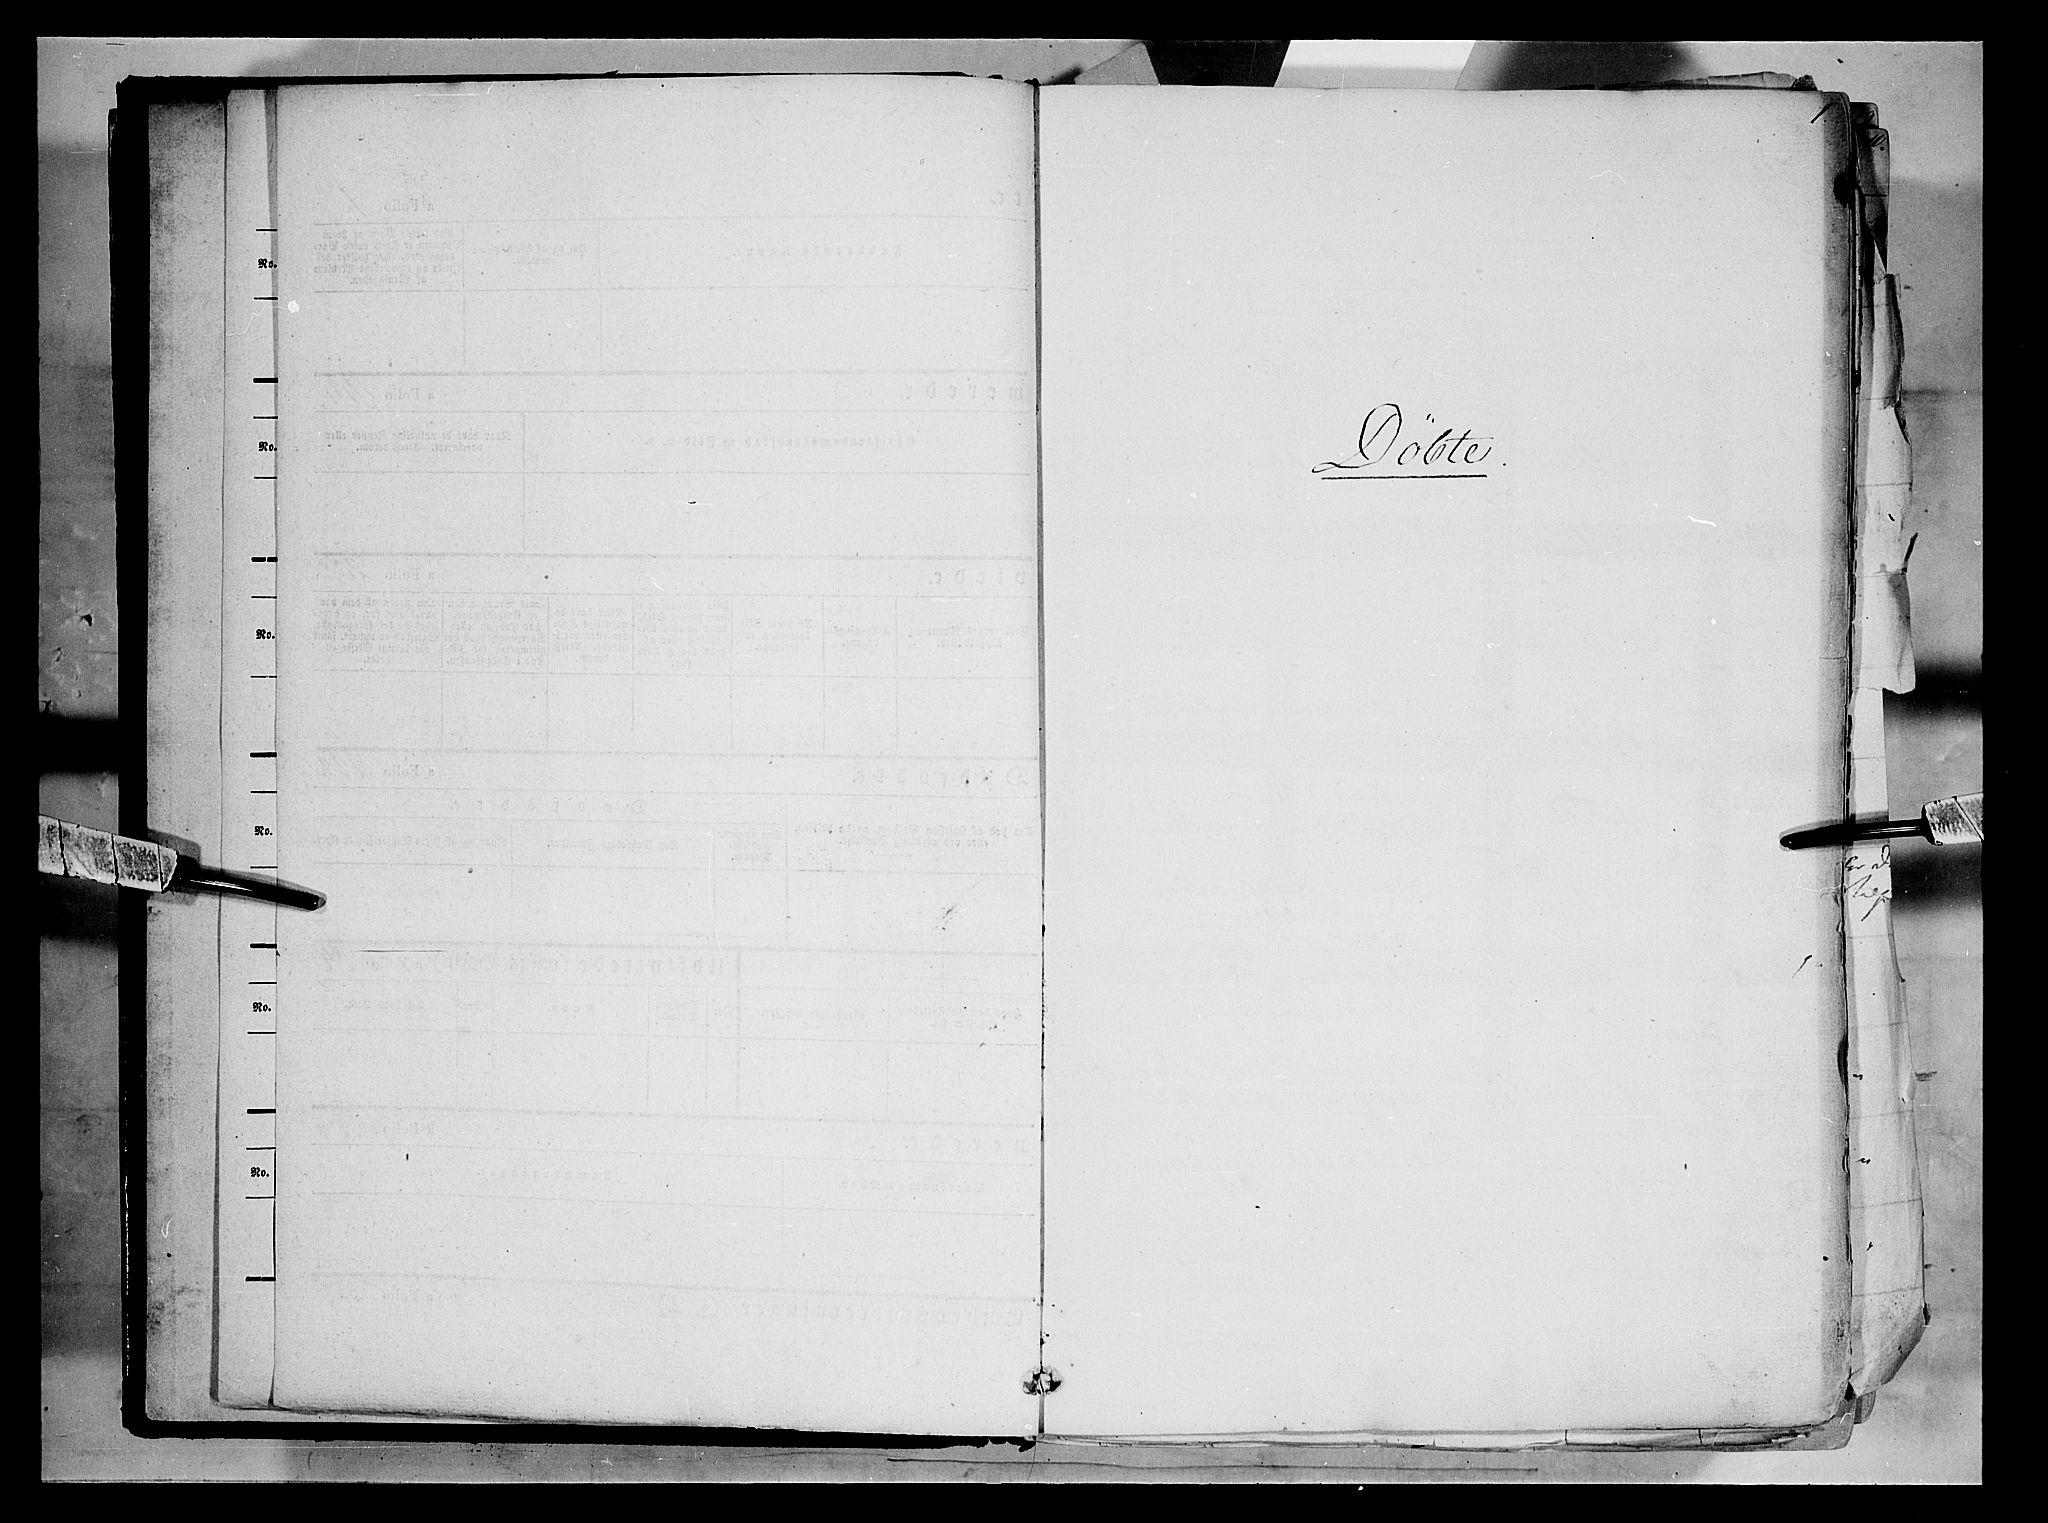 SAH, Gausdal prestekontor, Ministerialbok nr. 7, 1840-1850, s. 1